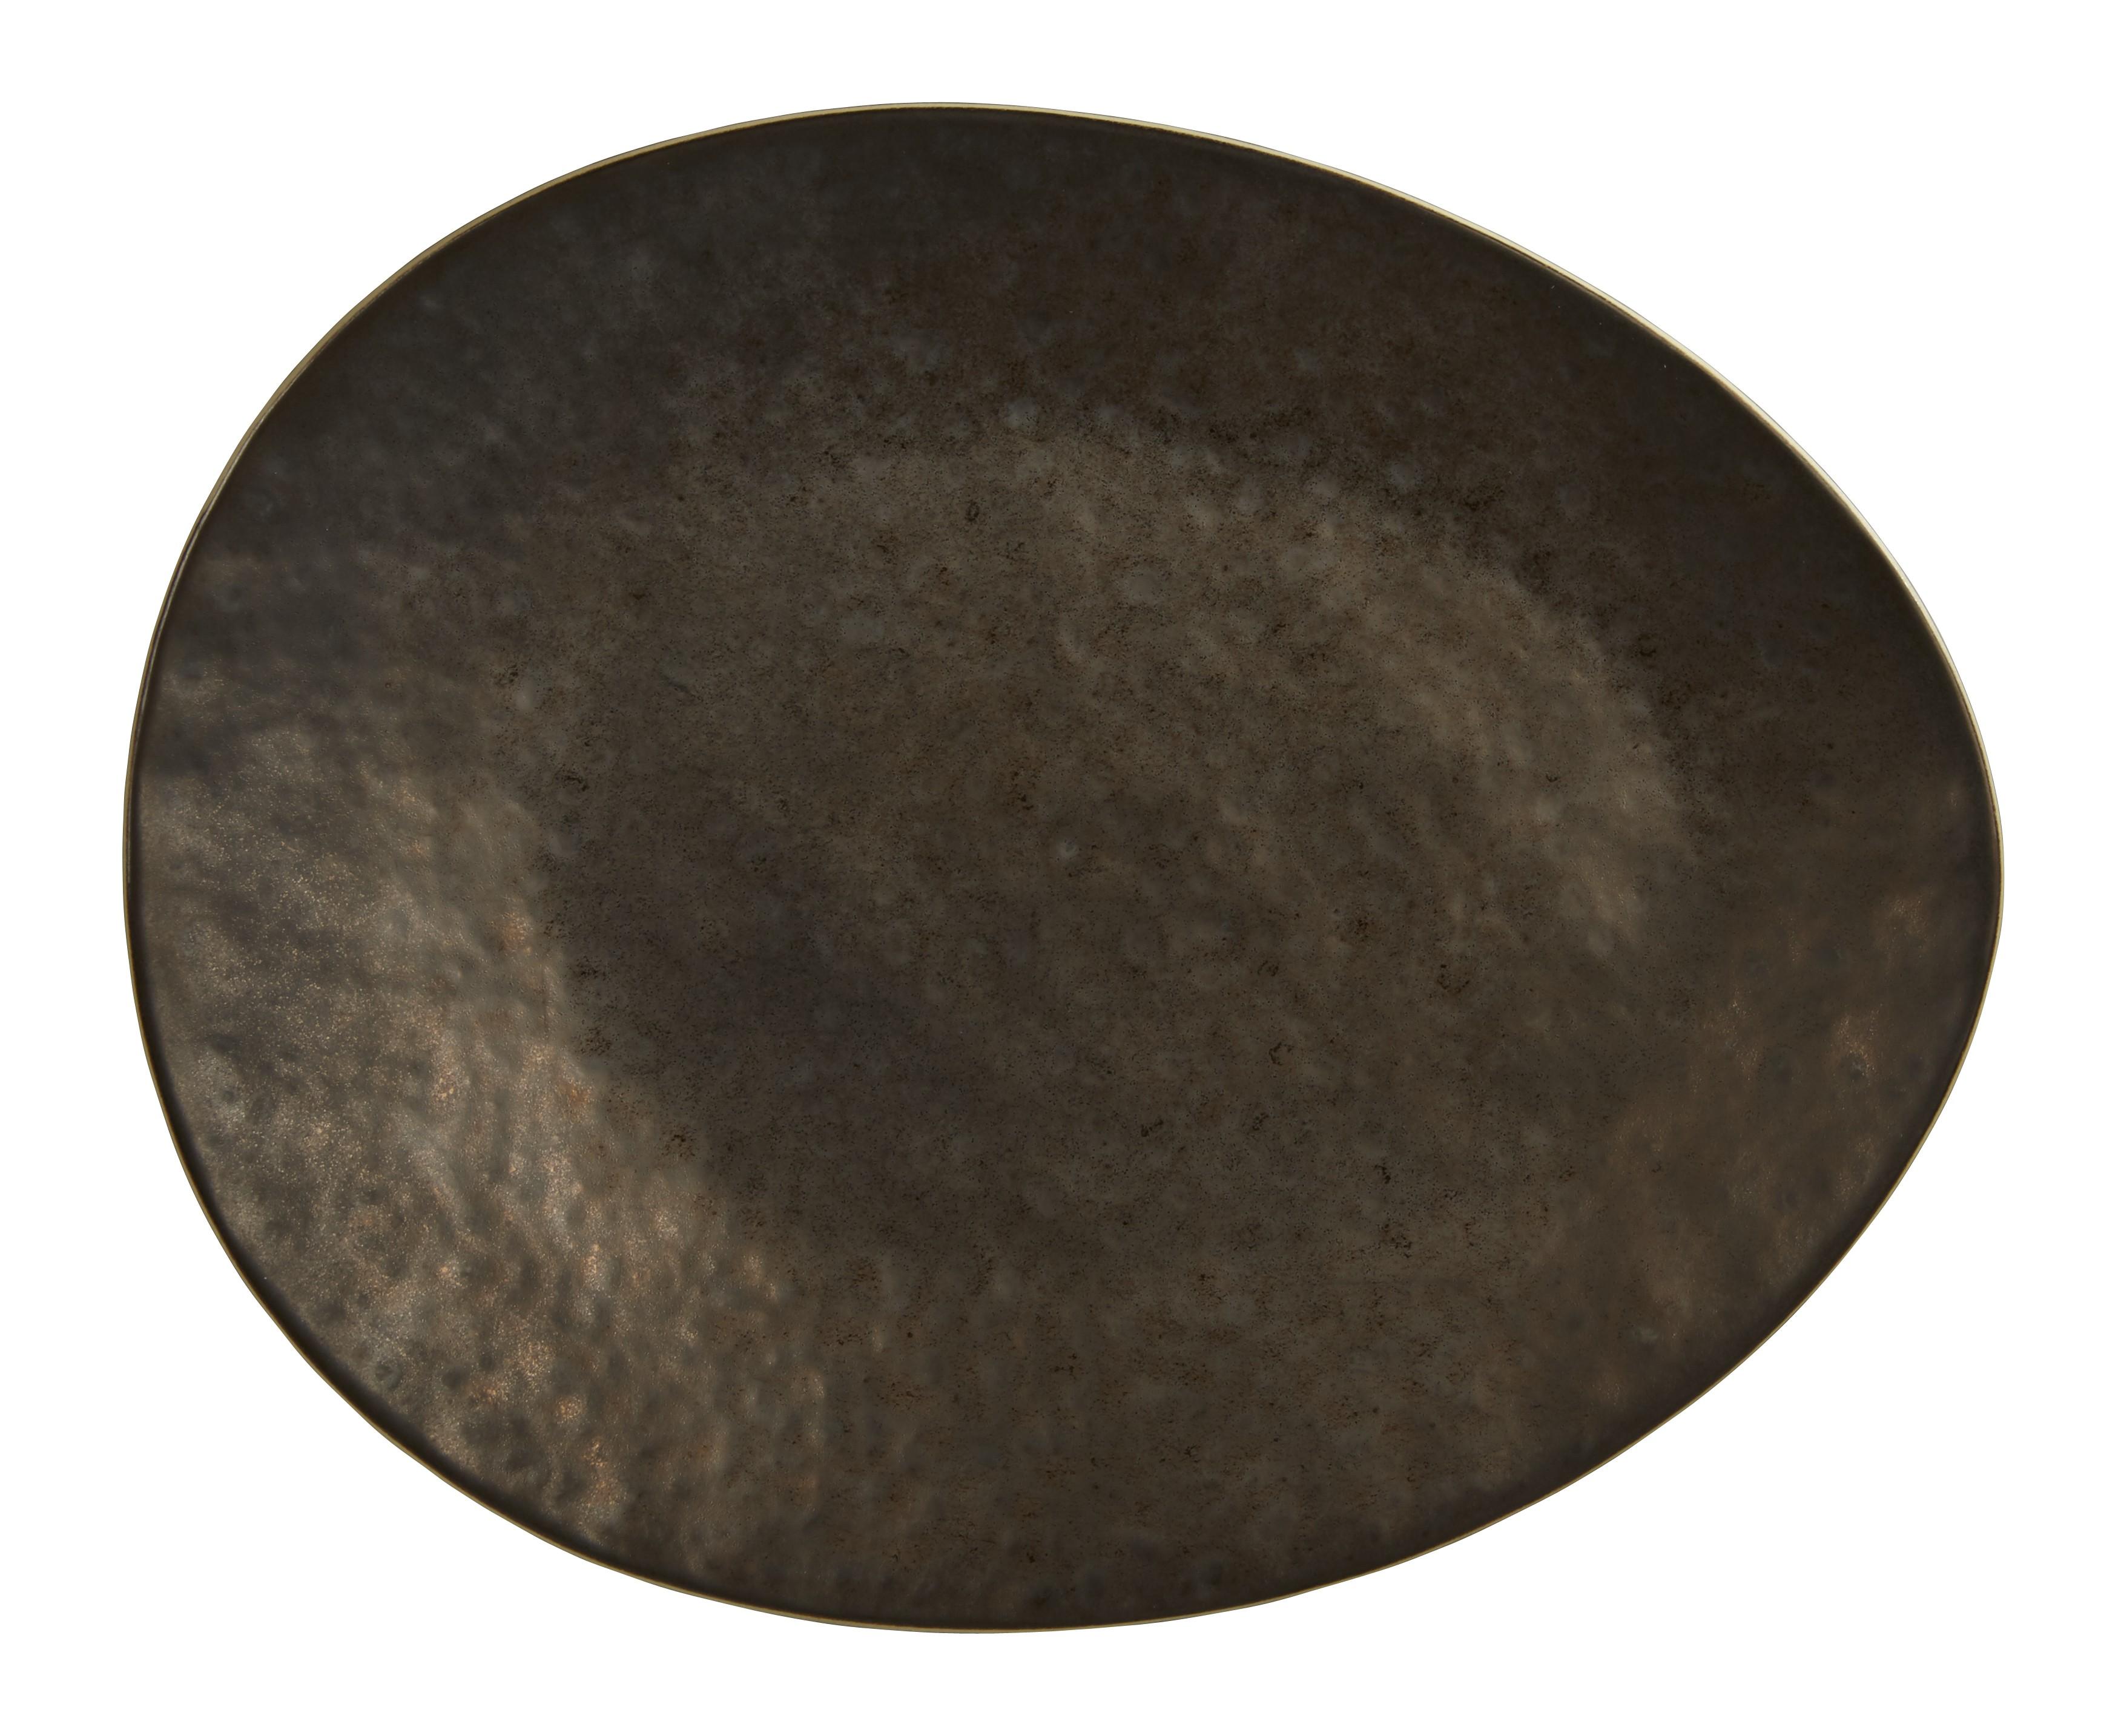 Rustico azteca Cena 27cm Plate